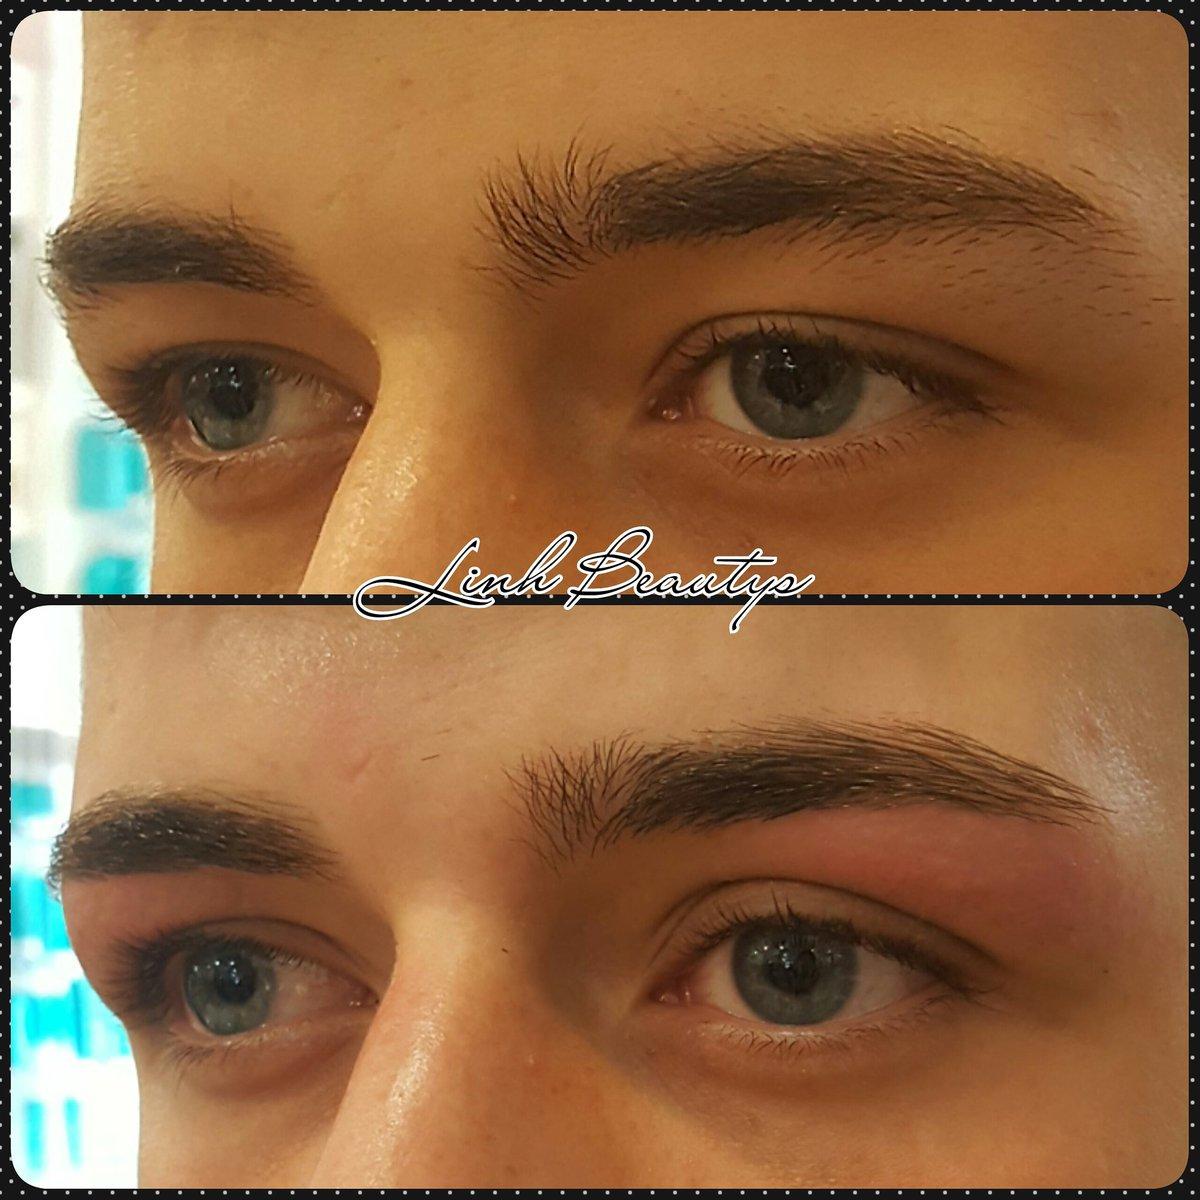 #eyebrows #maneyebrows #waxing #manly #linhbeautyspic.twitter.com/8f9Ex9jOFb